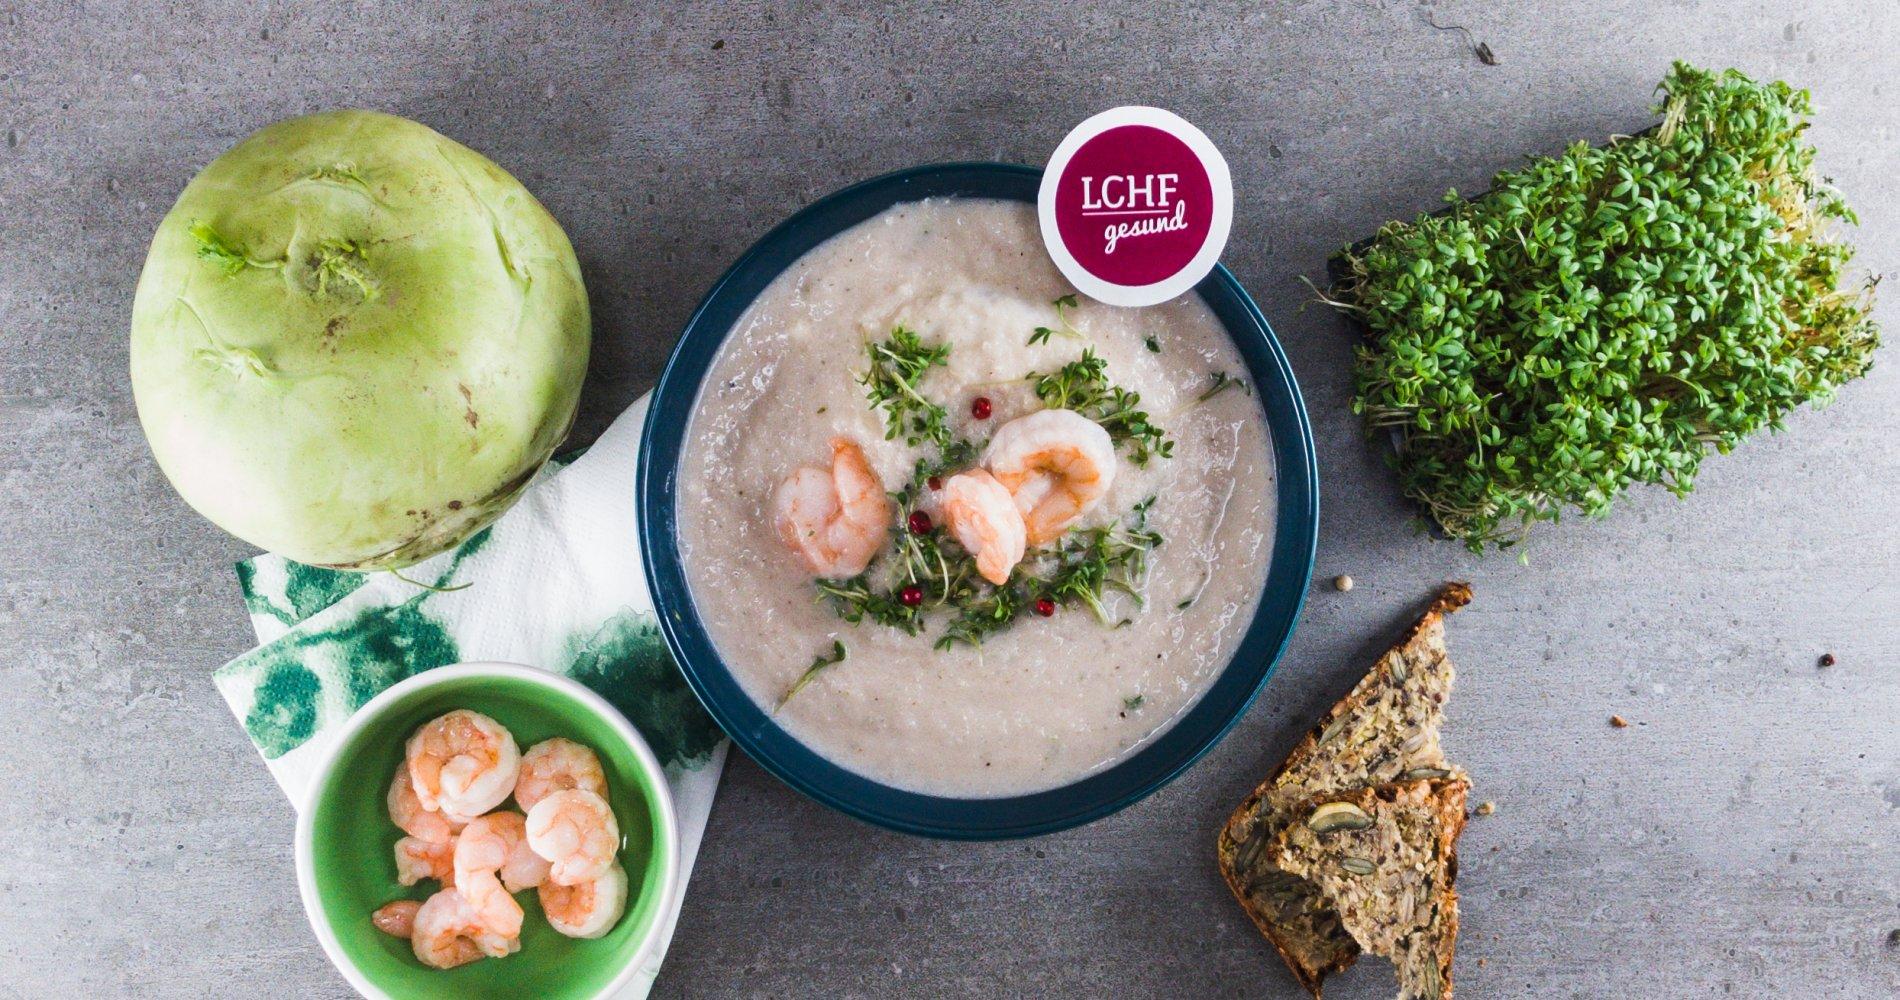 Rezept Low Carb: Kohlrabi-Blumenkohl-Suppe - LCHF-gesund.de